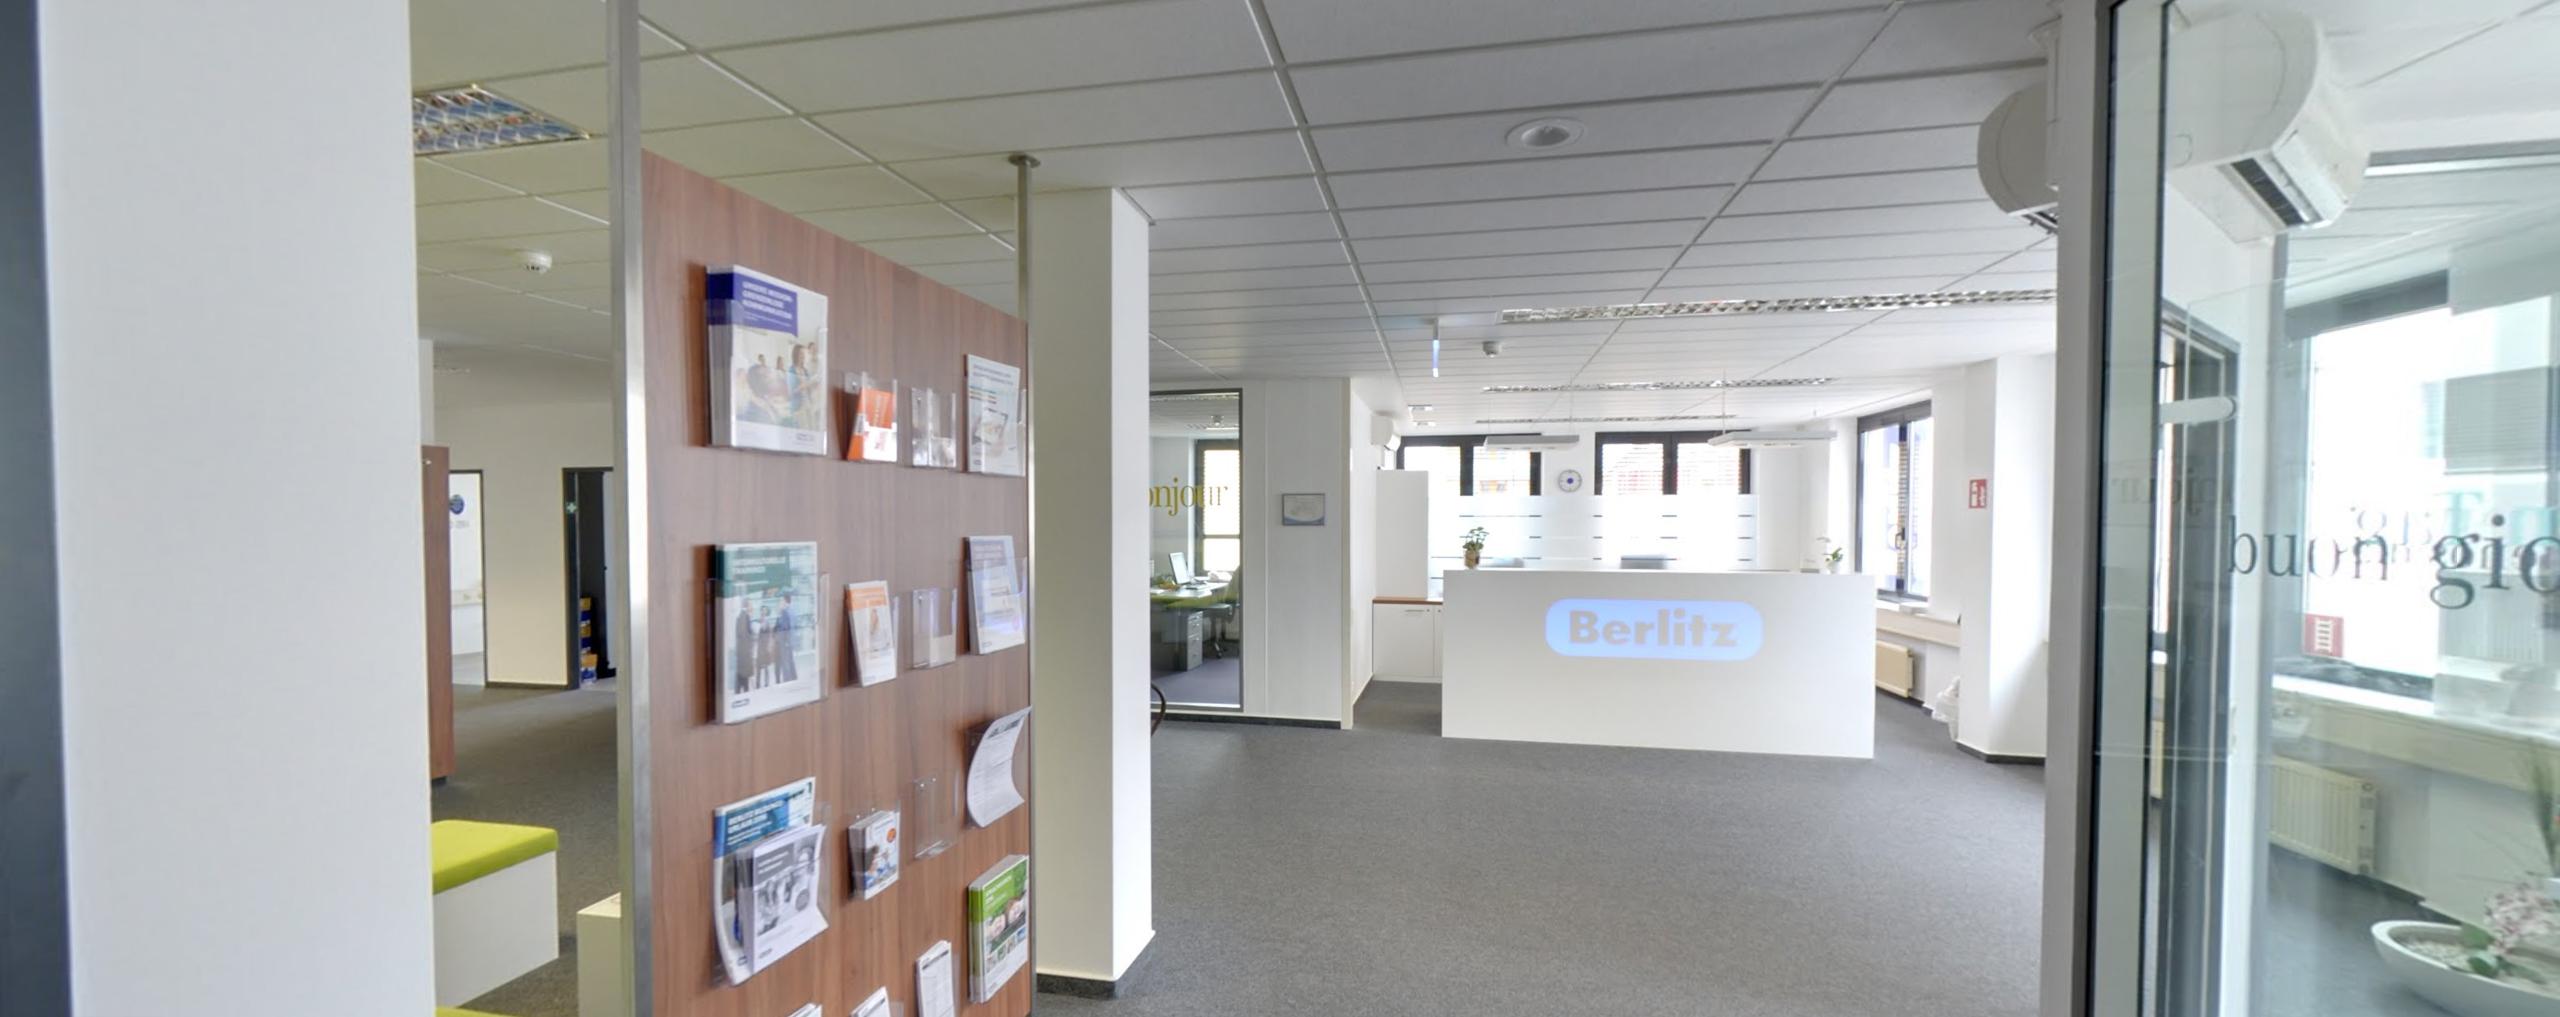 Berlitz Sprachschule Mainz